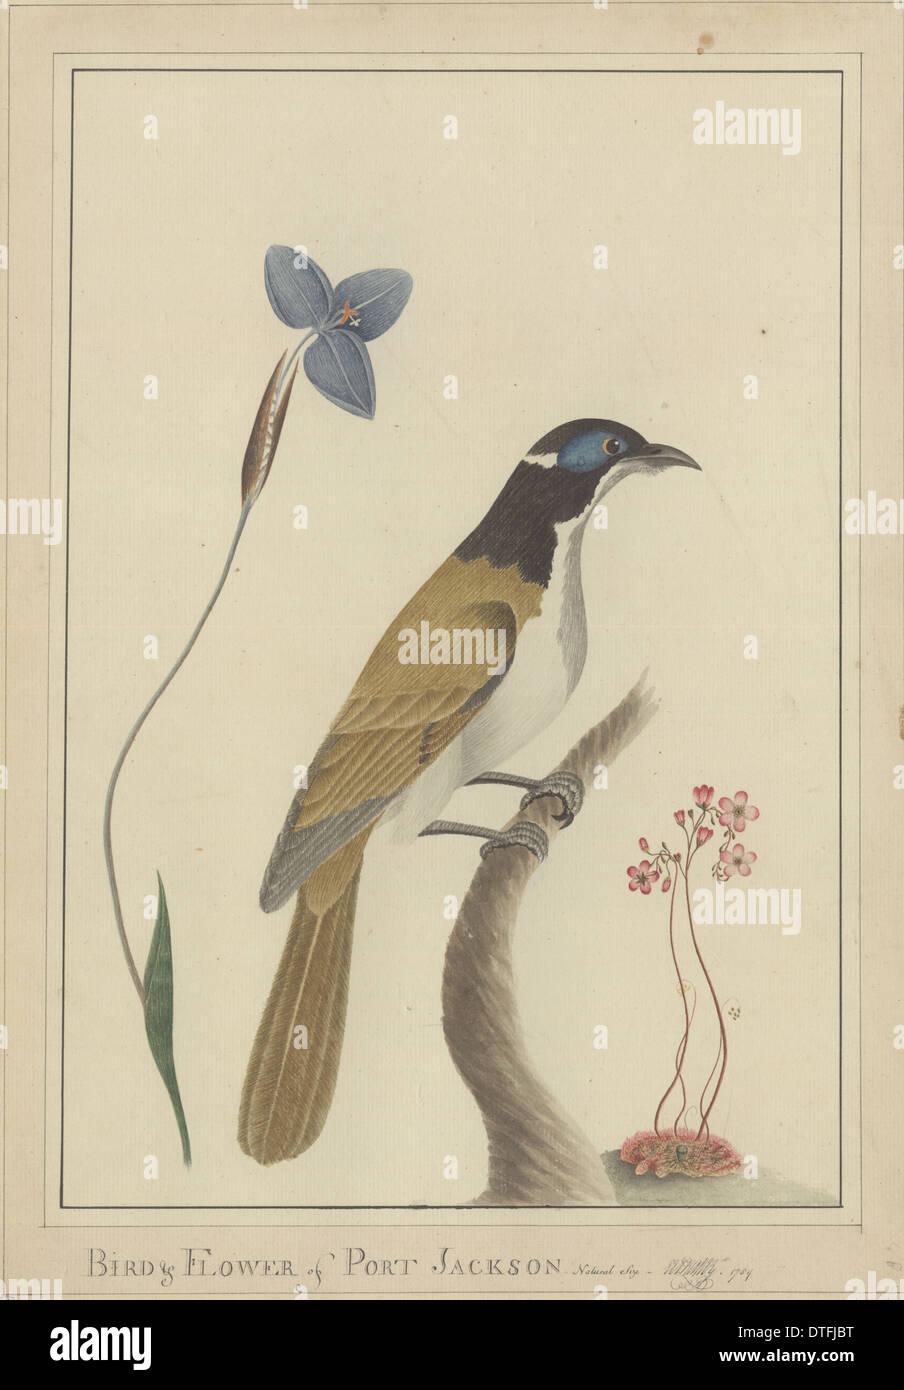 Bird & Flower of Port Jackson - Stock Image